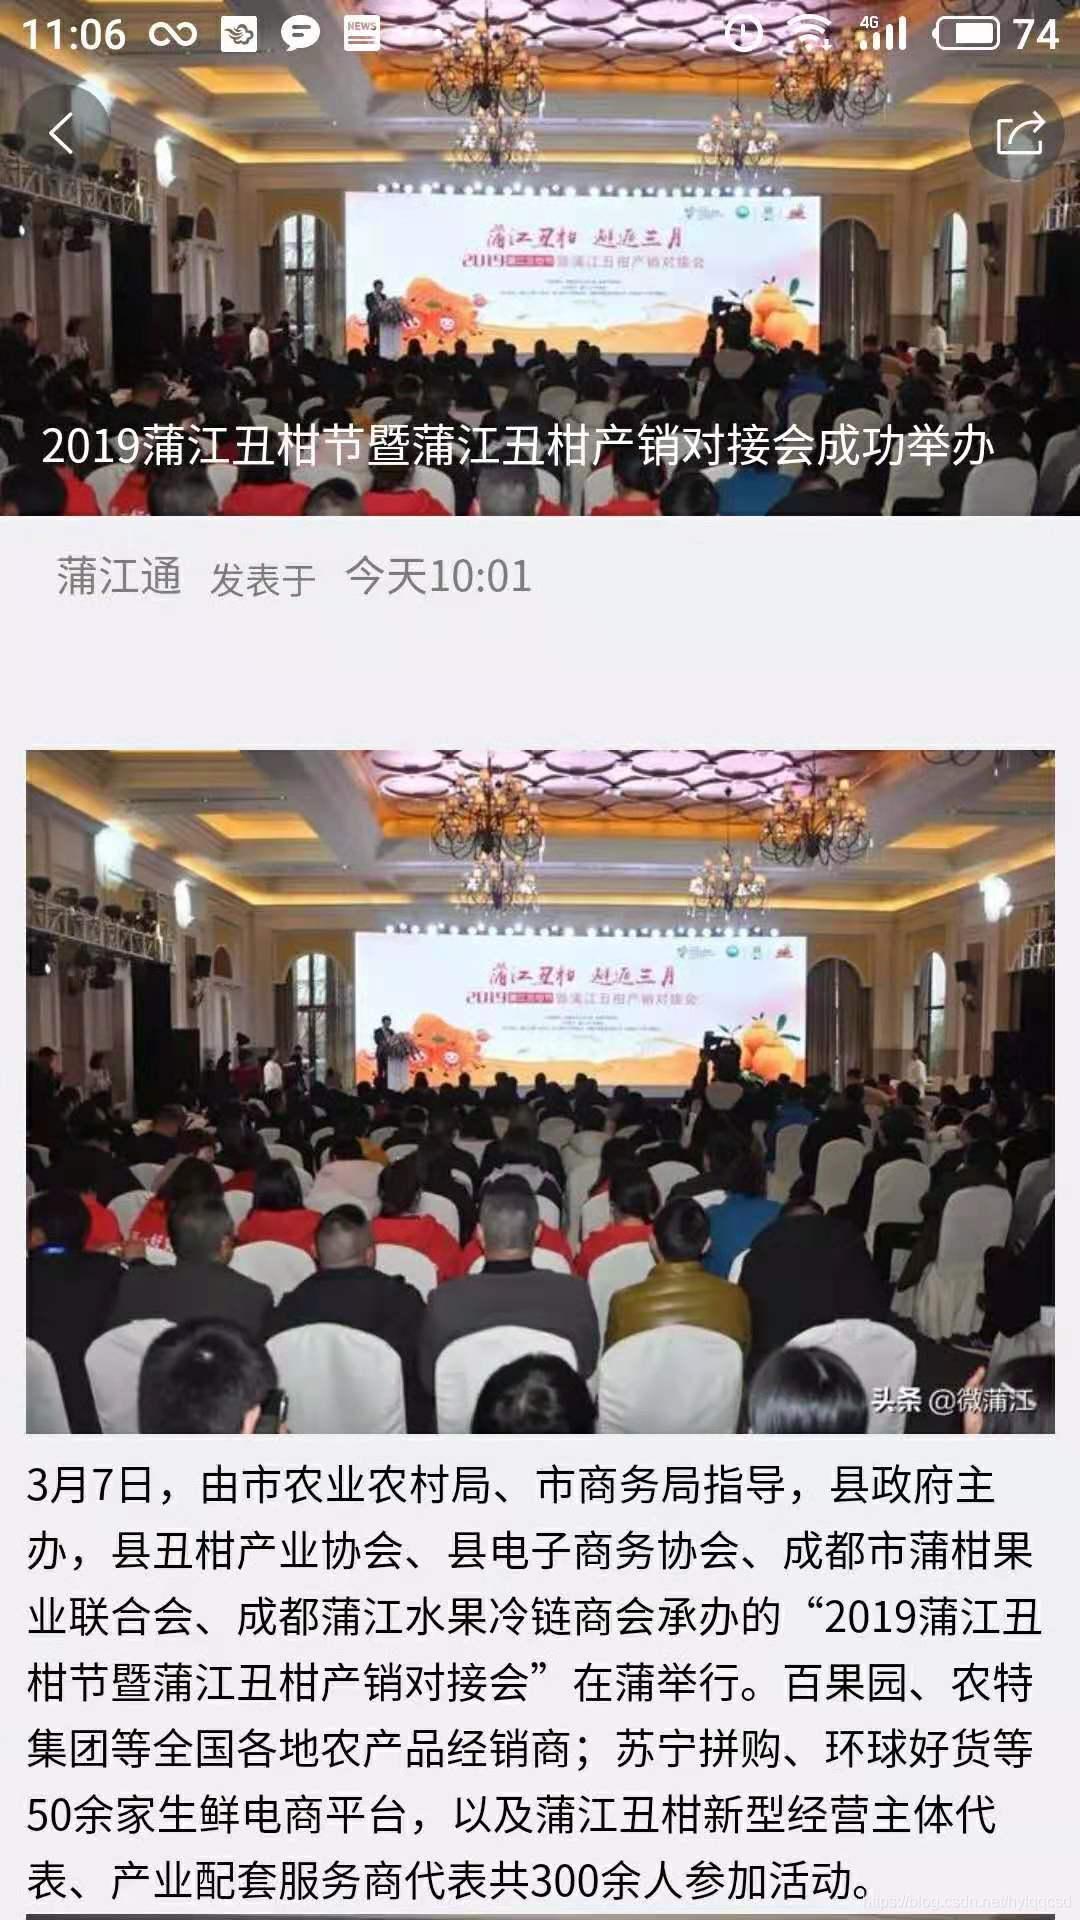 uni-app开发的本地社交应用'蒲江通'